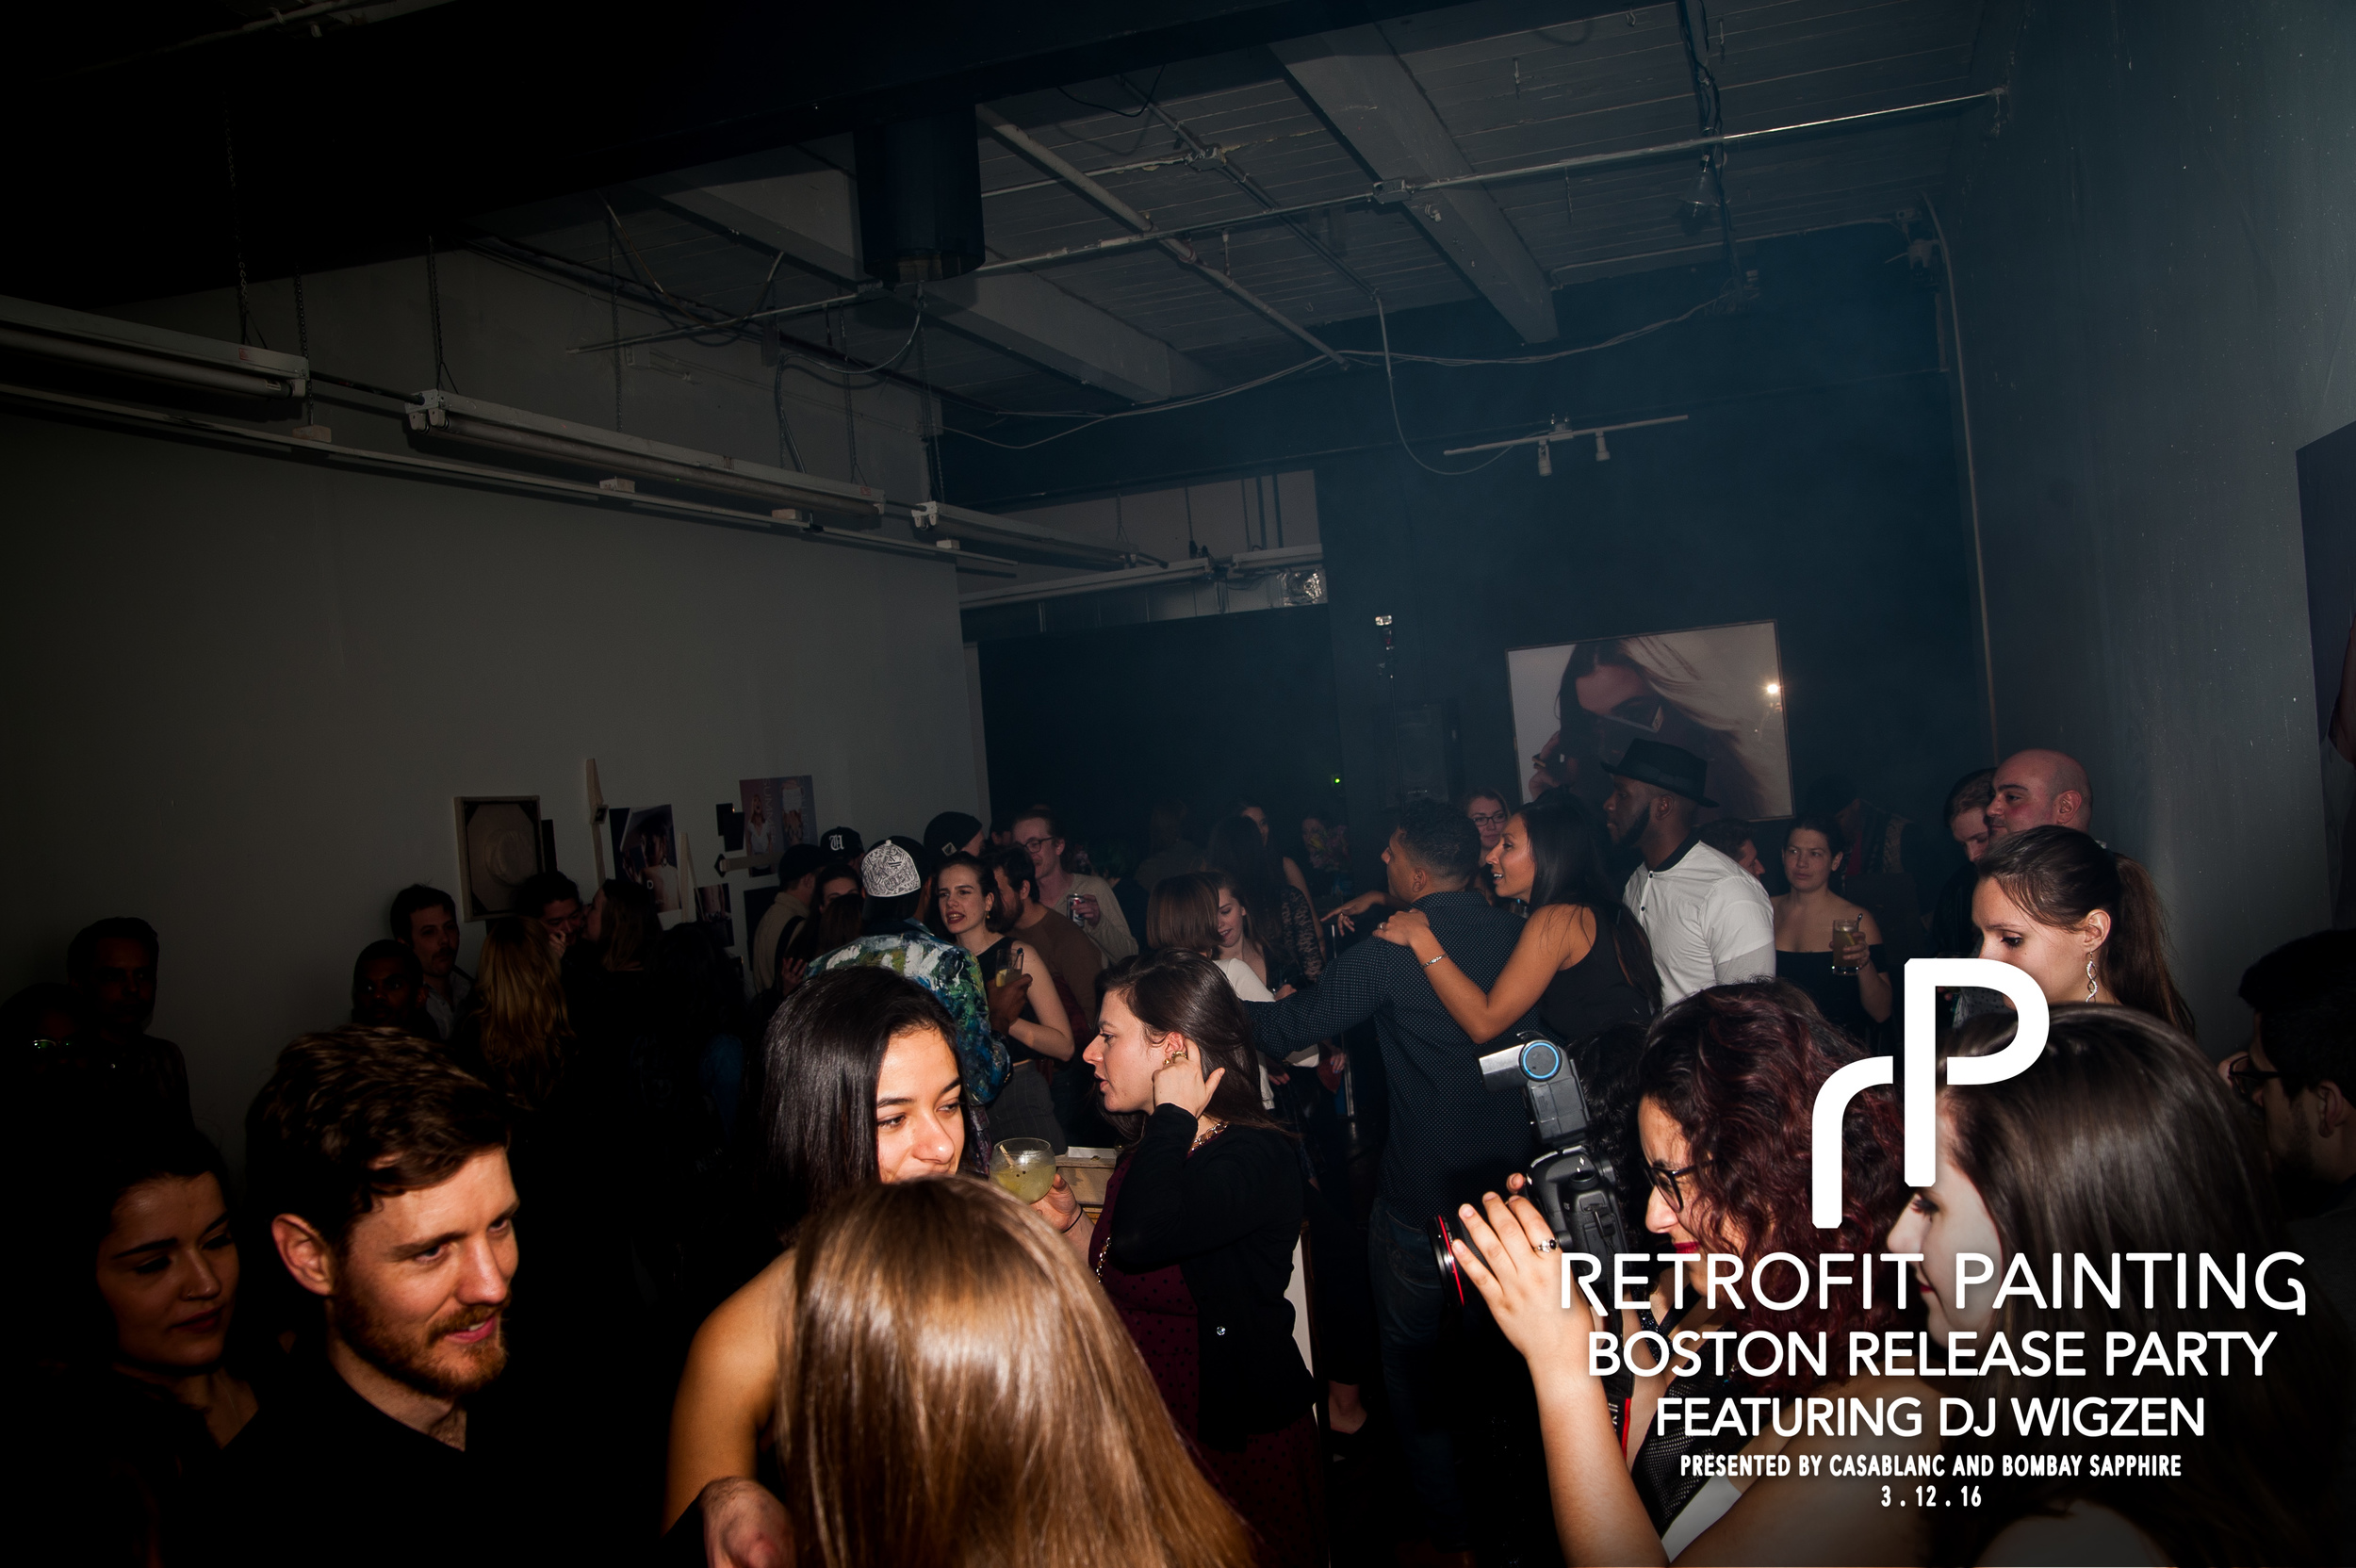 Retrofit Painting Boston Release Party 0012.jpg